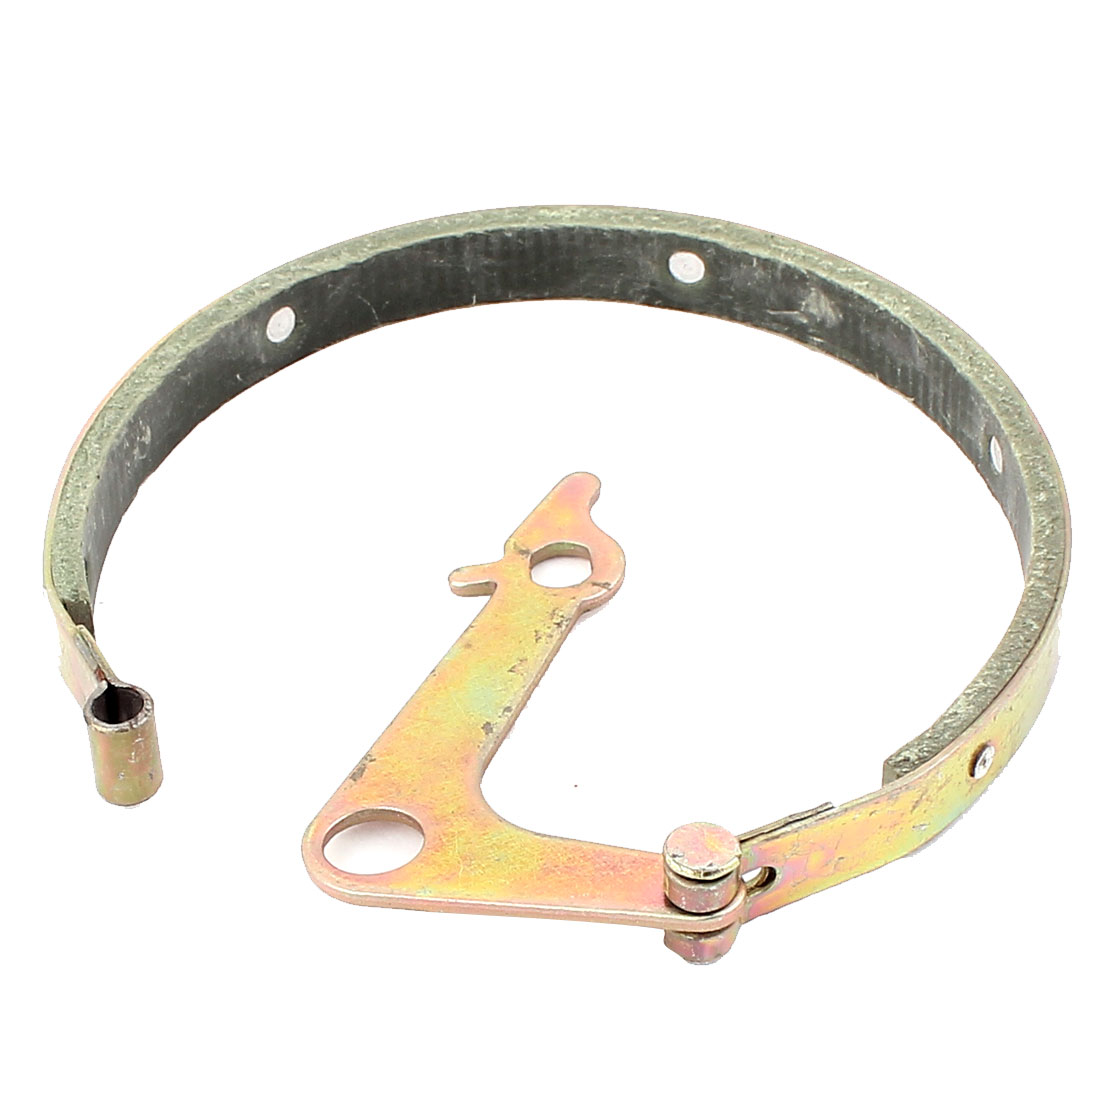 "Stroller Gocart Mini Bike Replacement Metal 3 1/4"" Rear Brake Drum Band"